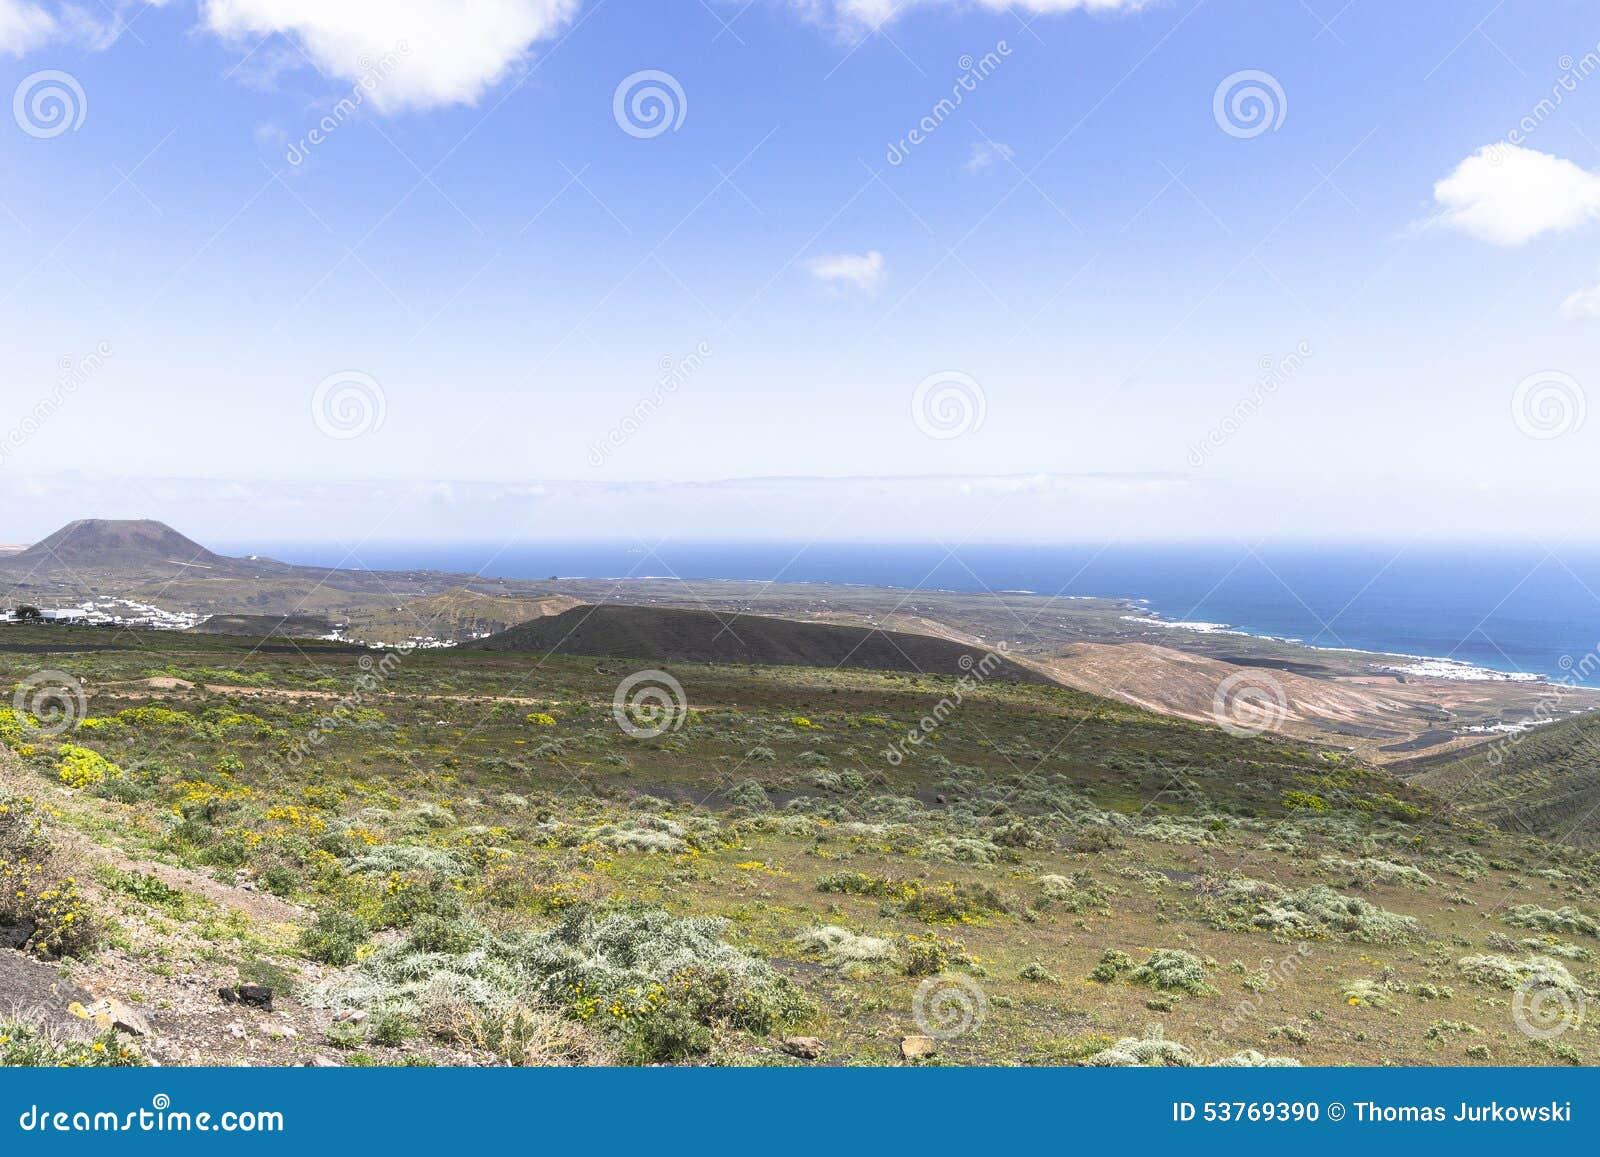 Lanzarote Landscapes Stock Photo Image Of Marina Hills